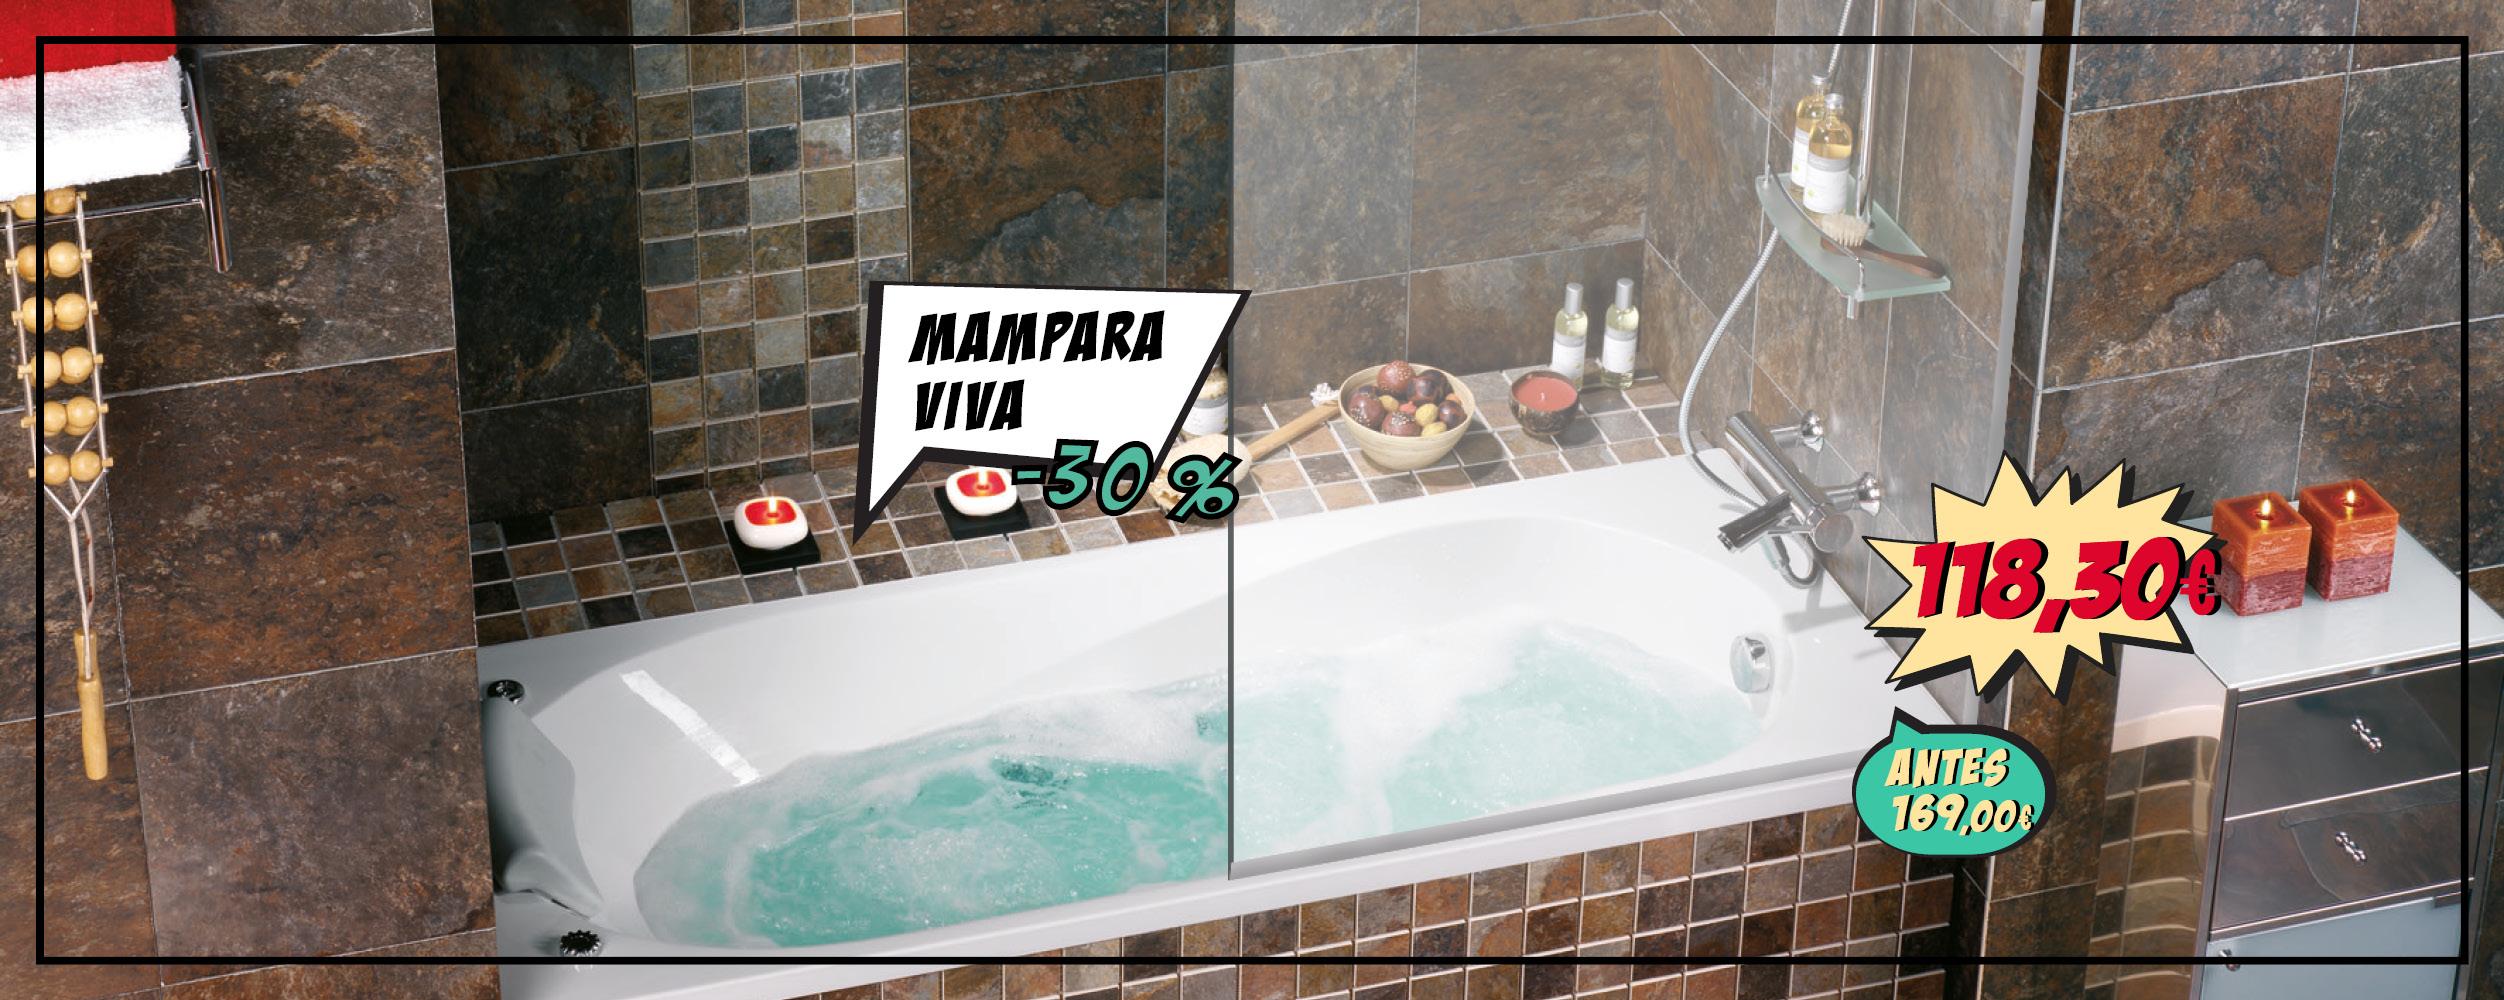 Mampara para bañera VIVA, ahora por 118,30€